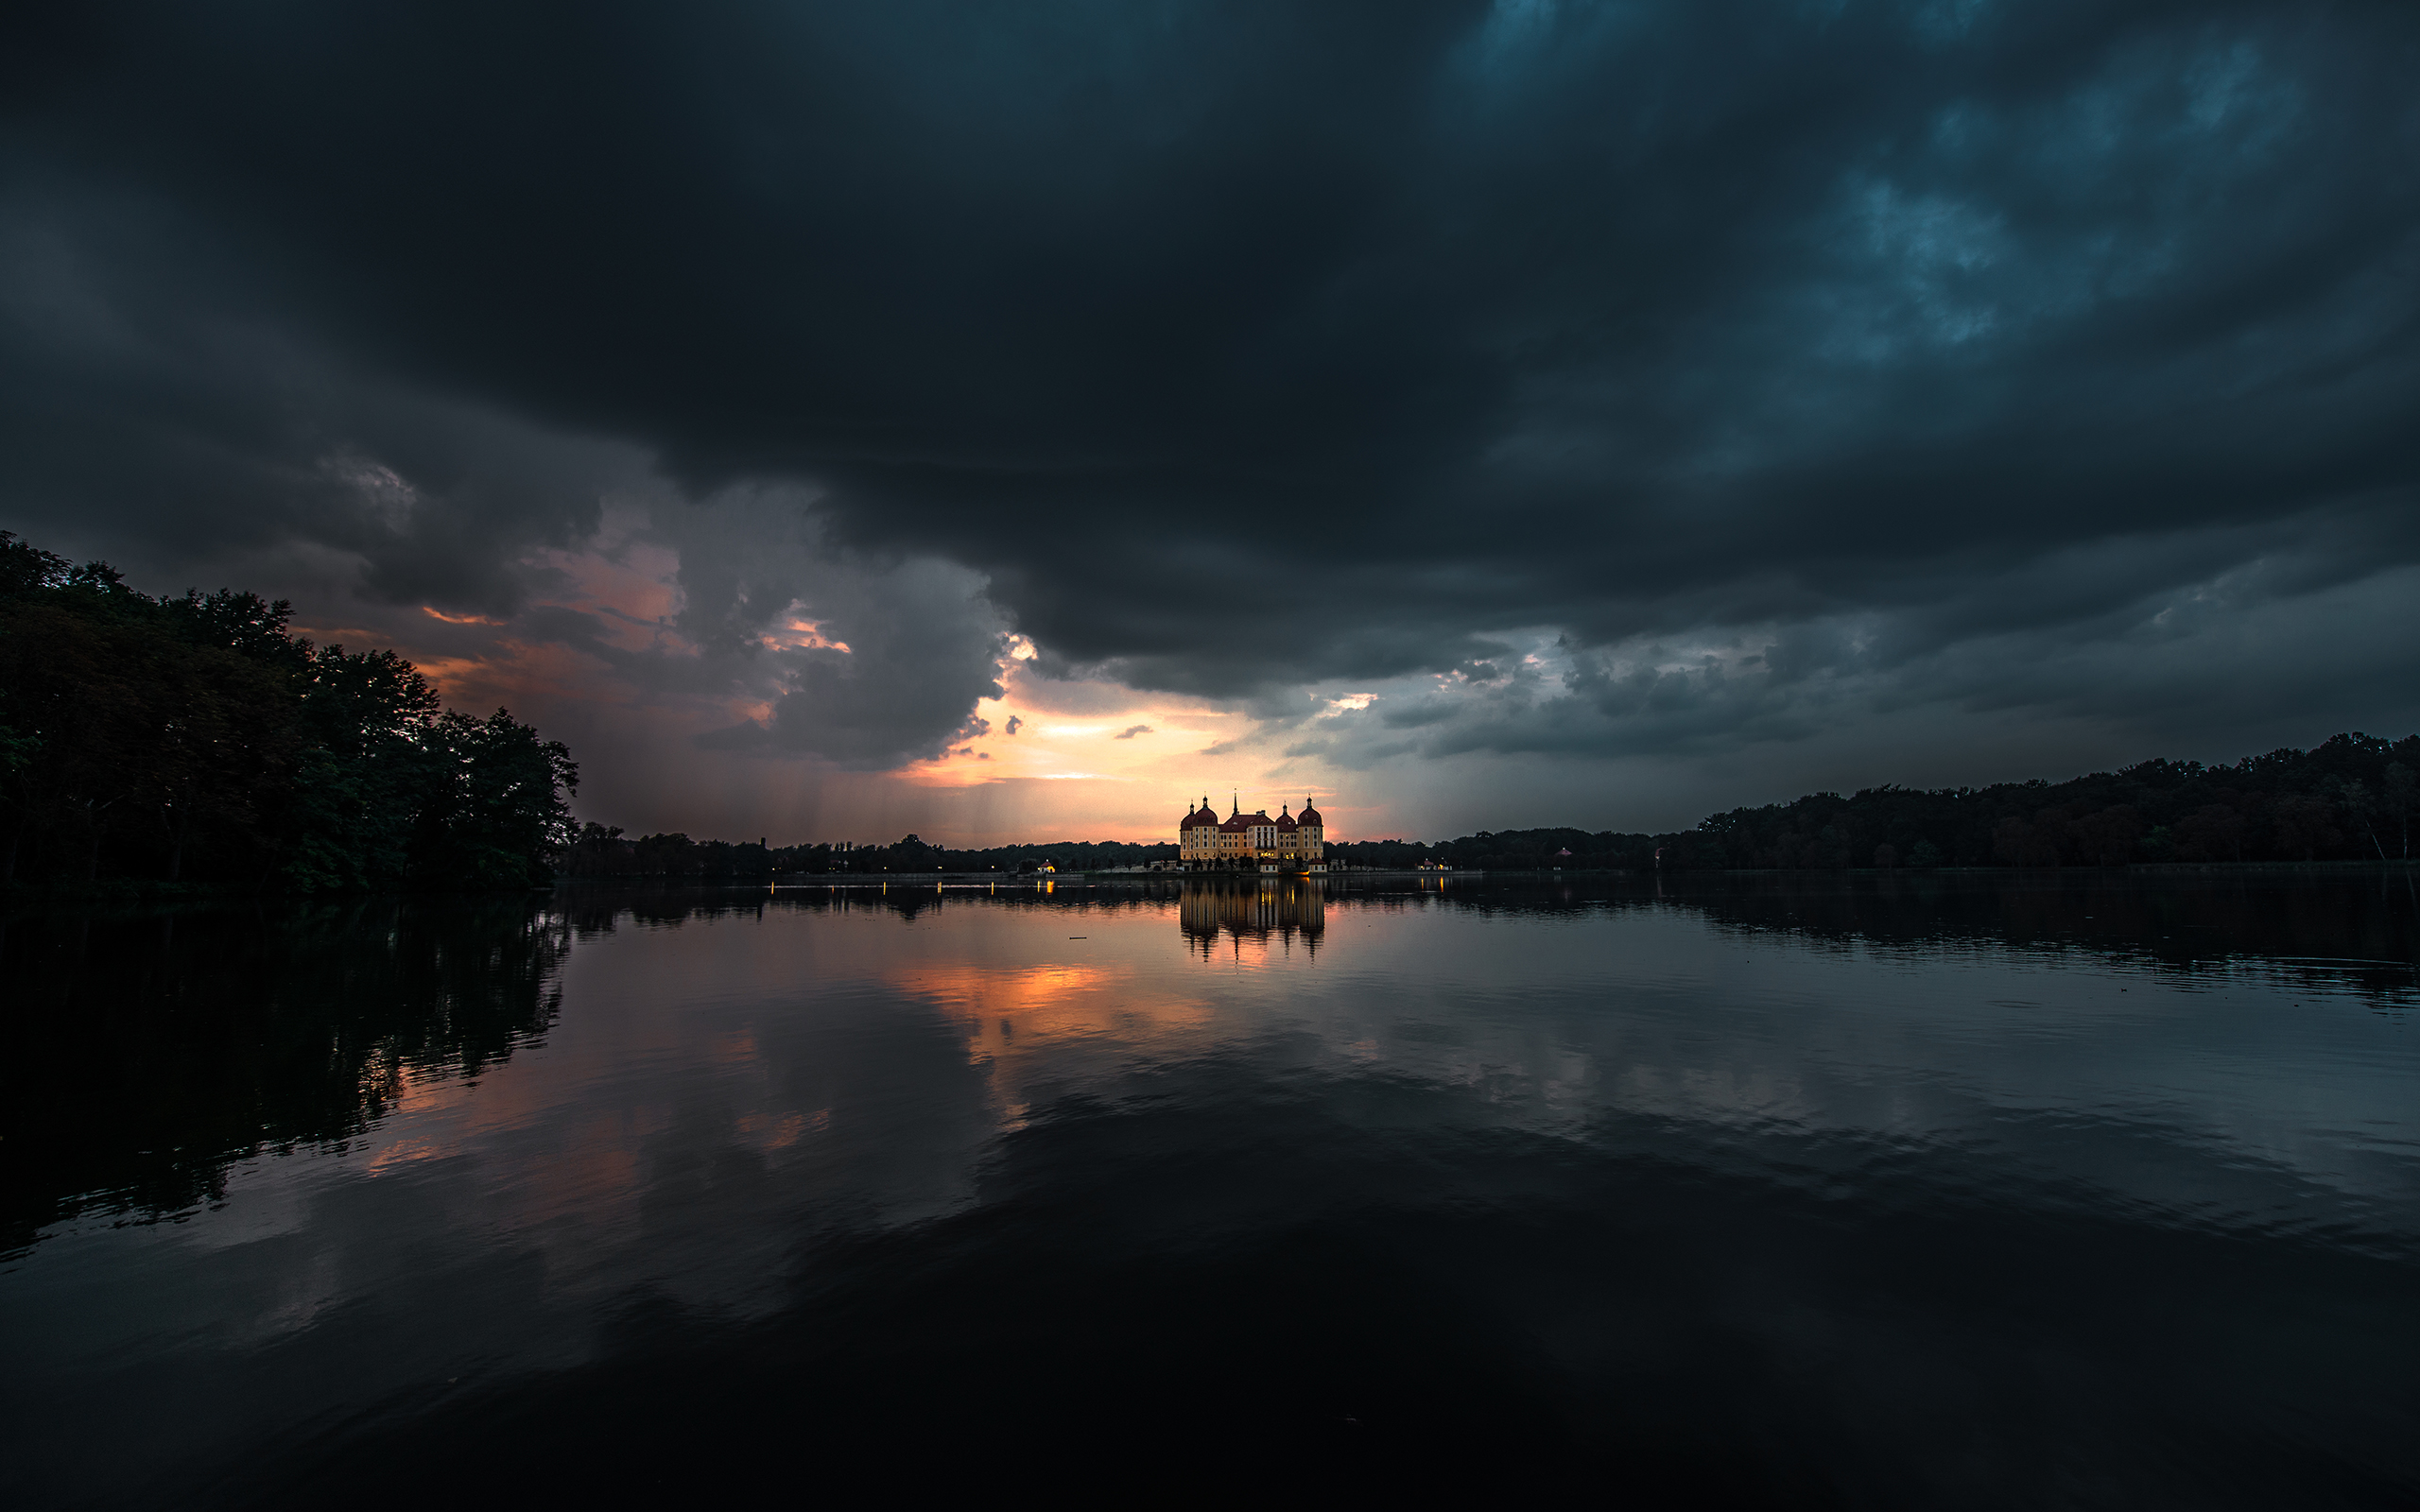 General 2560x1600 moritzburg castle castle lake night clouds reflection dark